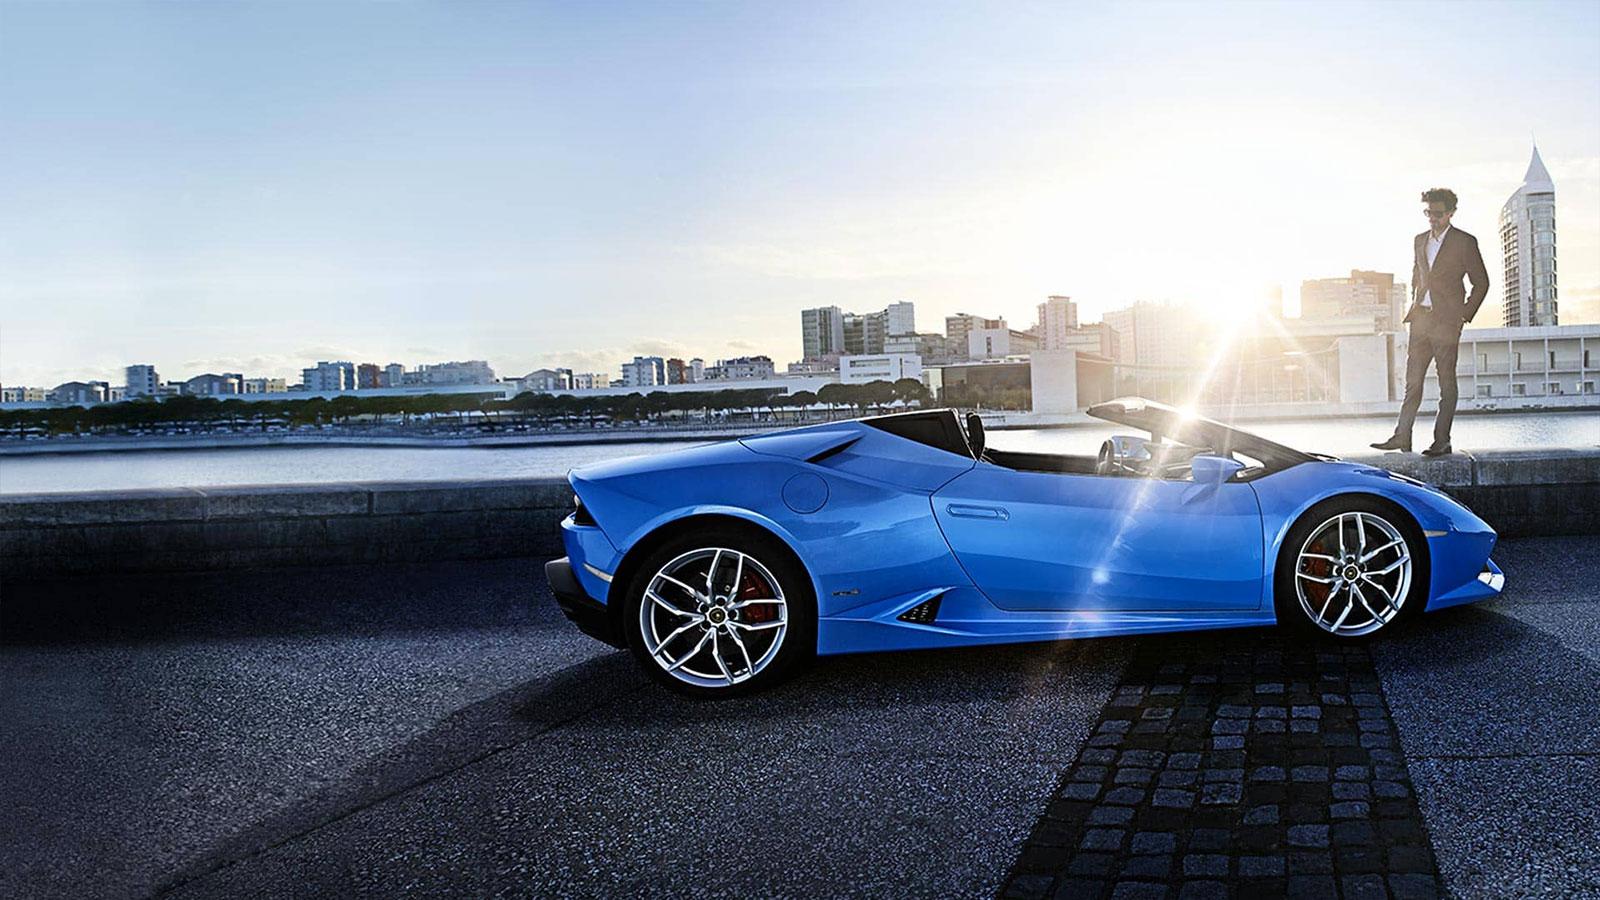 Lamborghini Huracan AWD Spyder - Inspiring Technology image 3